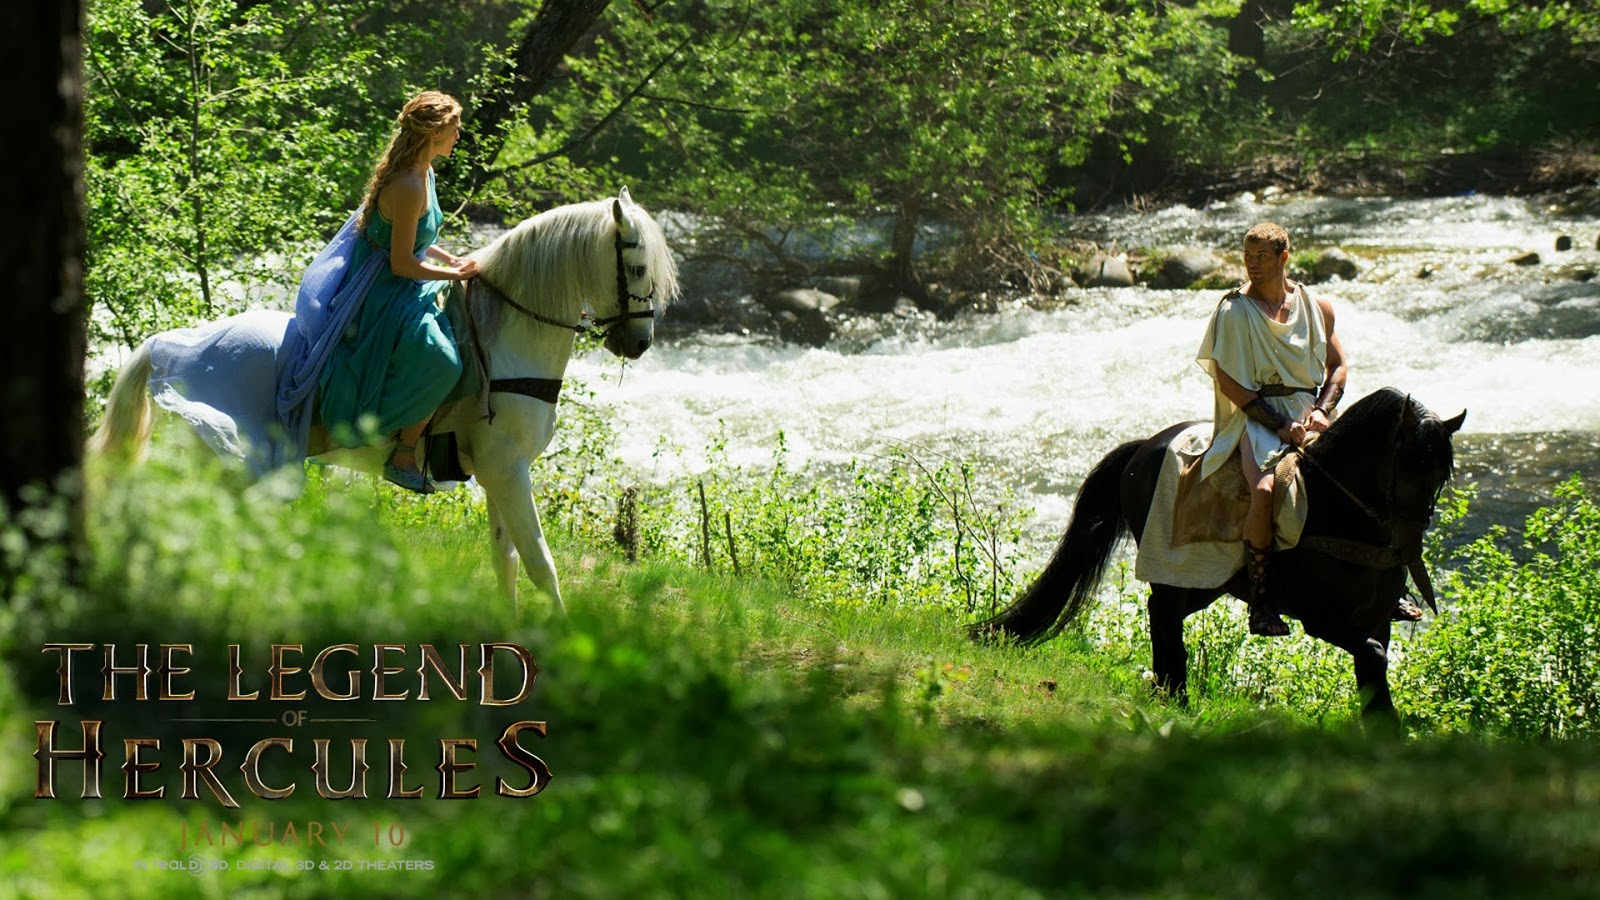 ����� ��� ���� The Legend of Hercules 2015 ���� The-Legend-of-Hercul